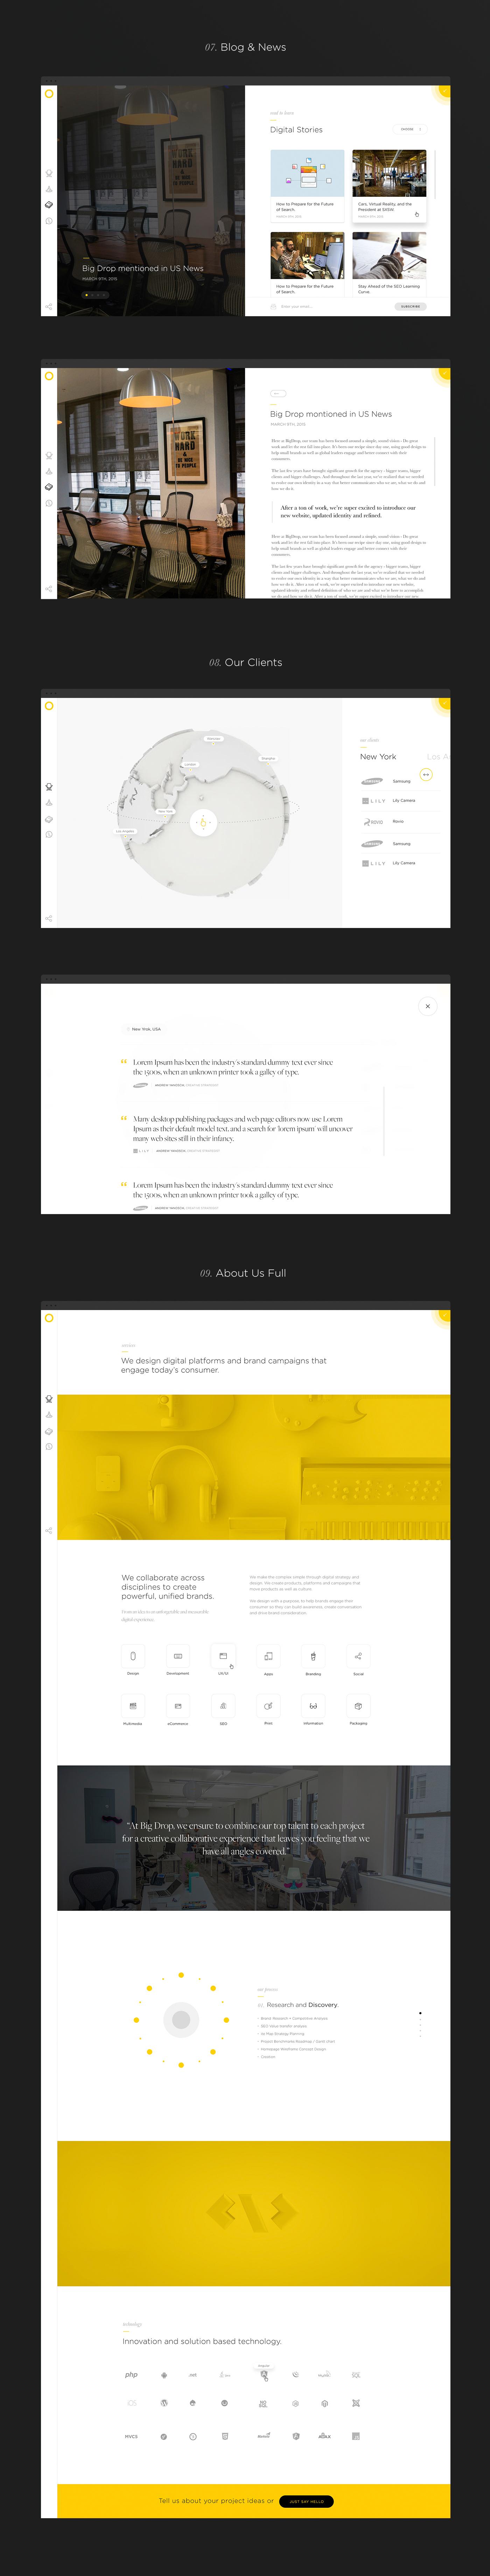 motion graphics  redesign icons grid Blog agency digital UI ux Webdesign